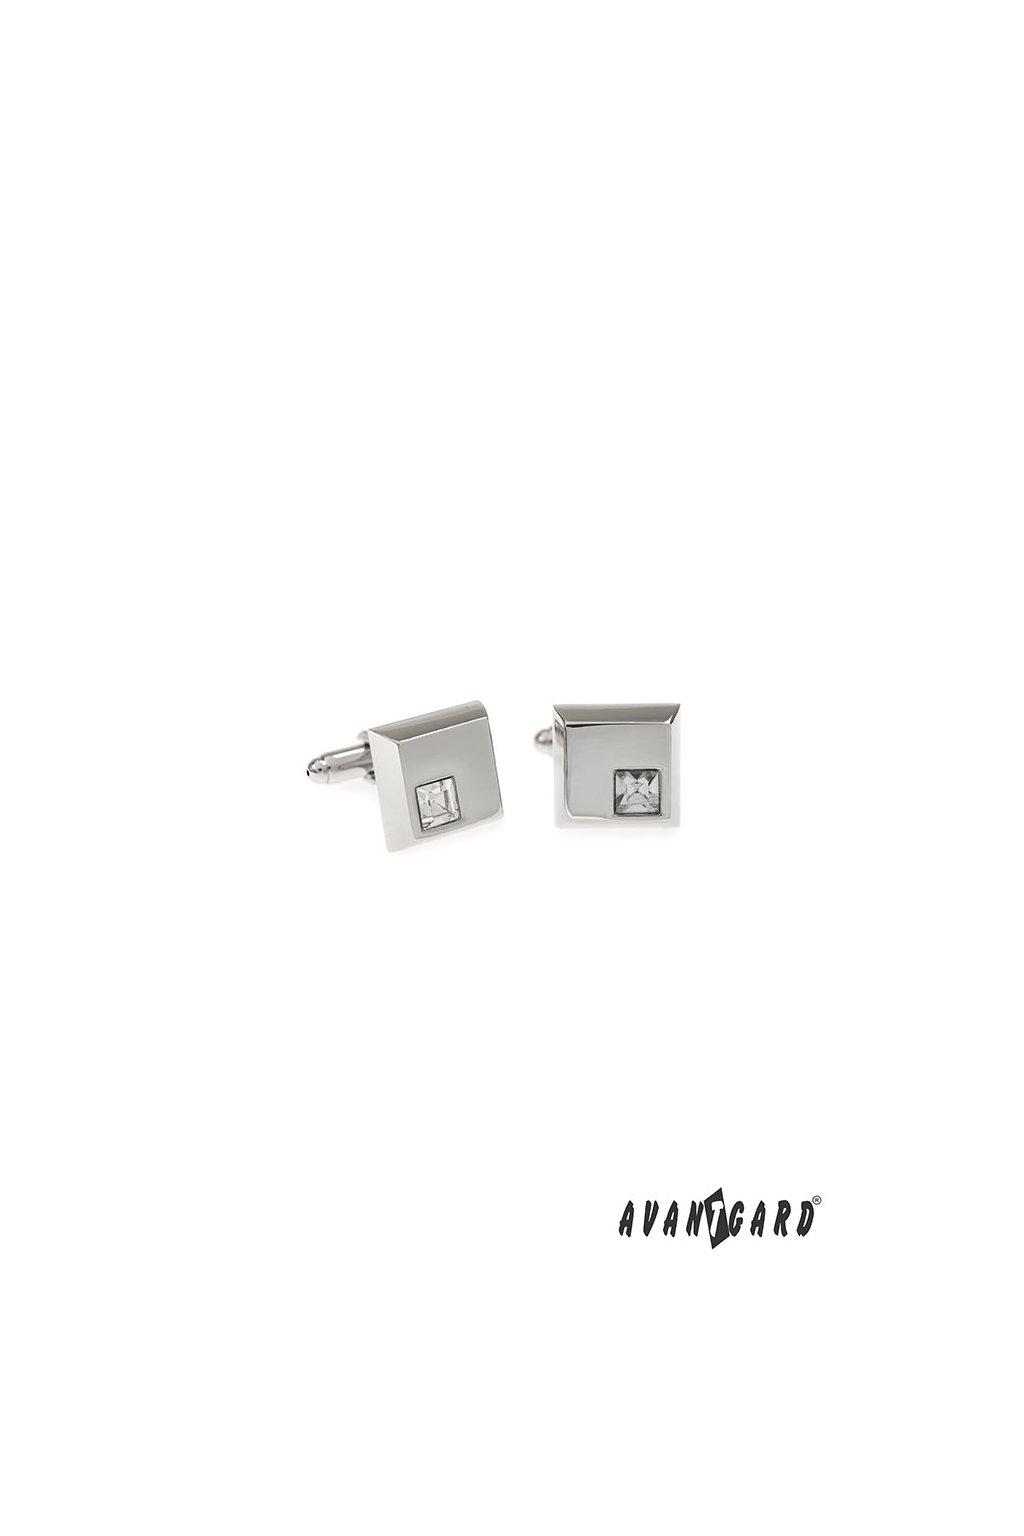 Manžetové knoflíčky PREMIUM, 573-20633, Stříbrná lesk/bílá